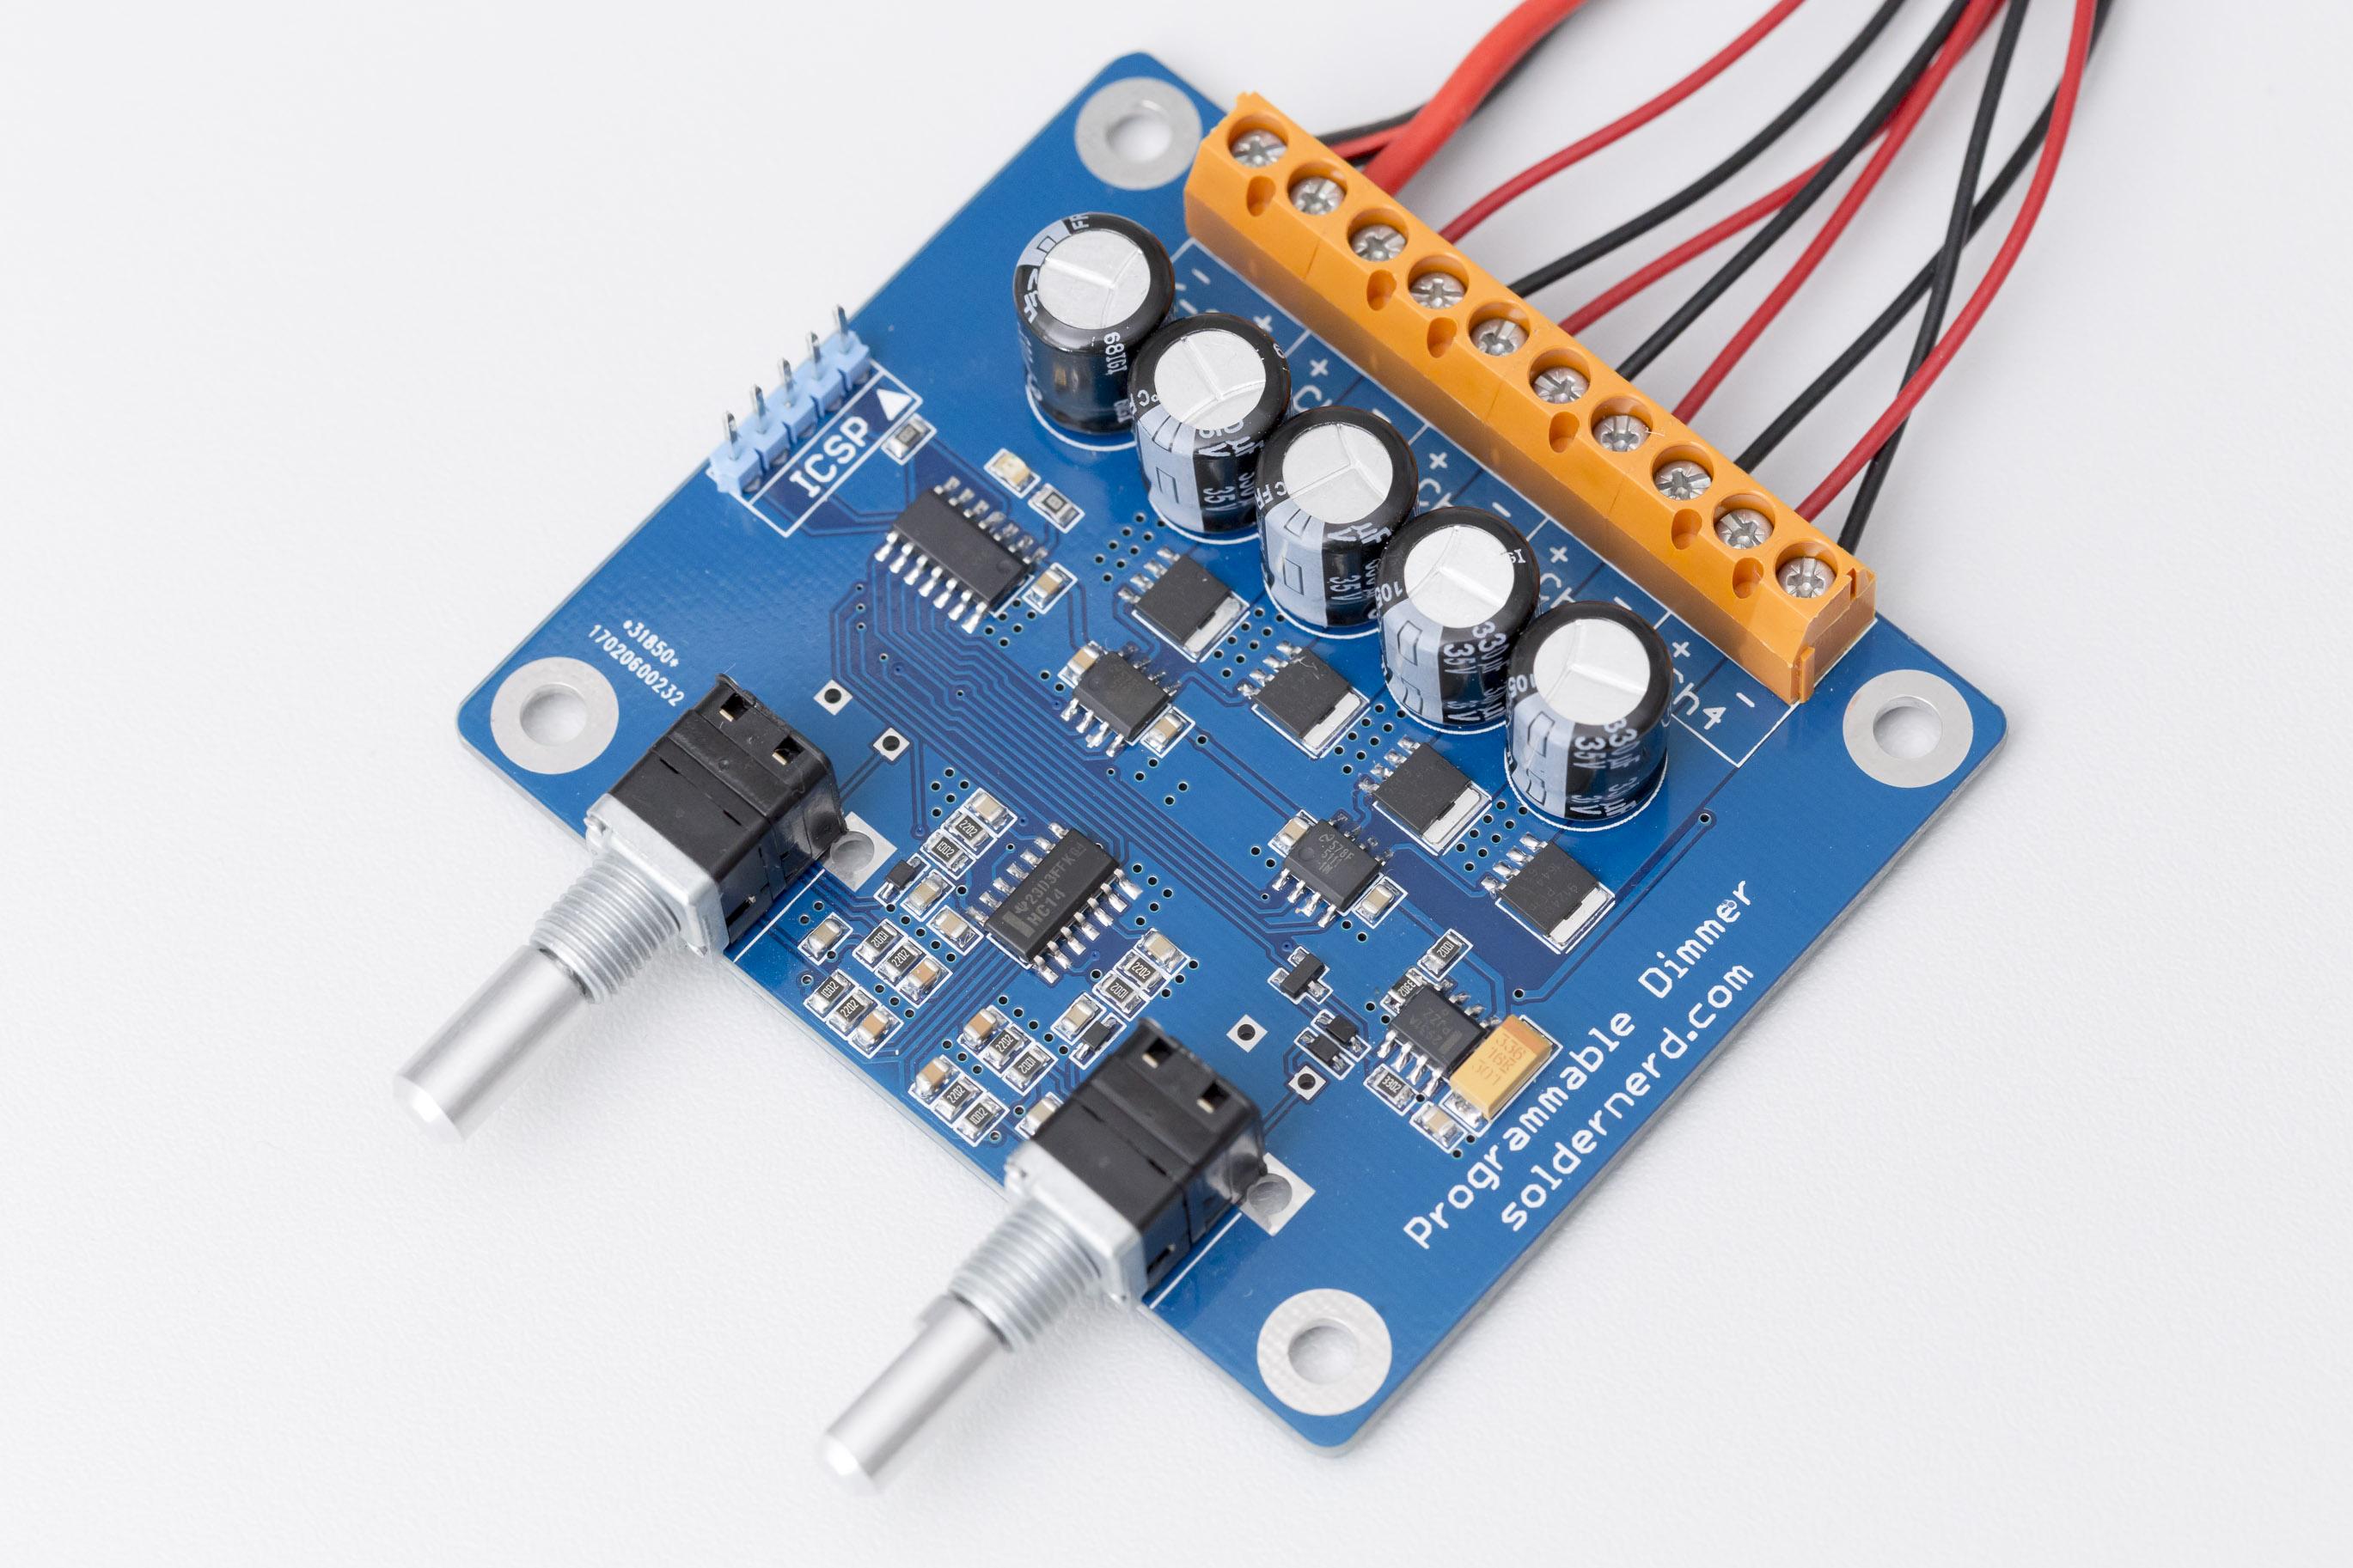 Programmable LED dimmer